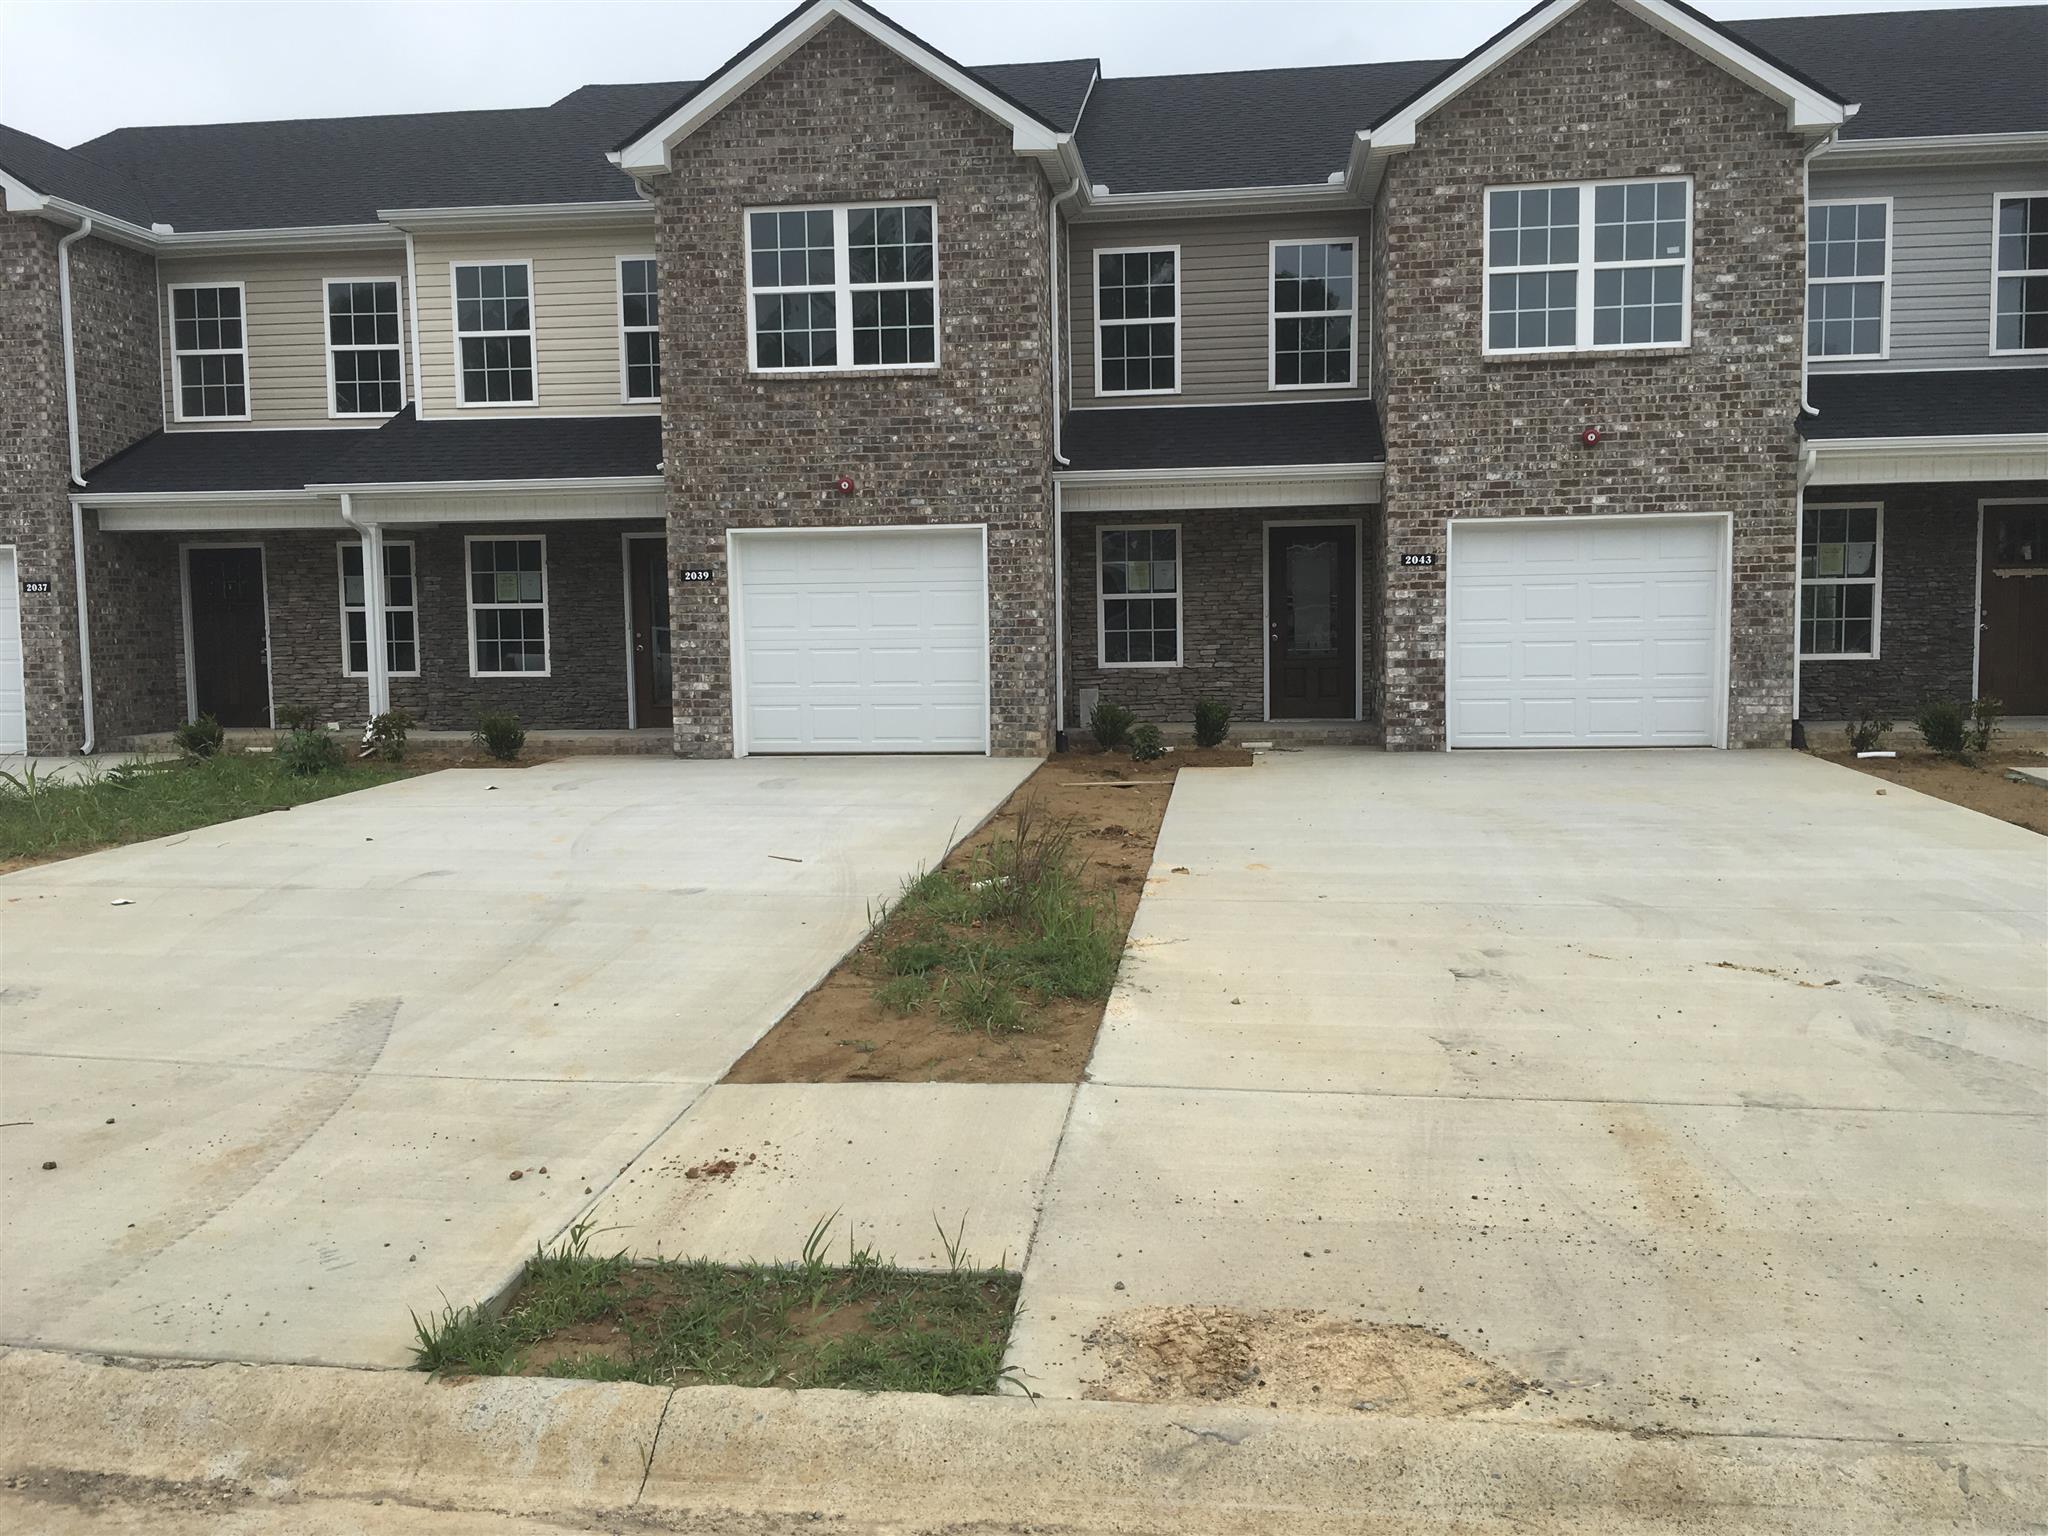 2043 Downstream Drive, Ashland City, TN 37015 - Ashland City, TN real estate listing